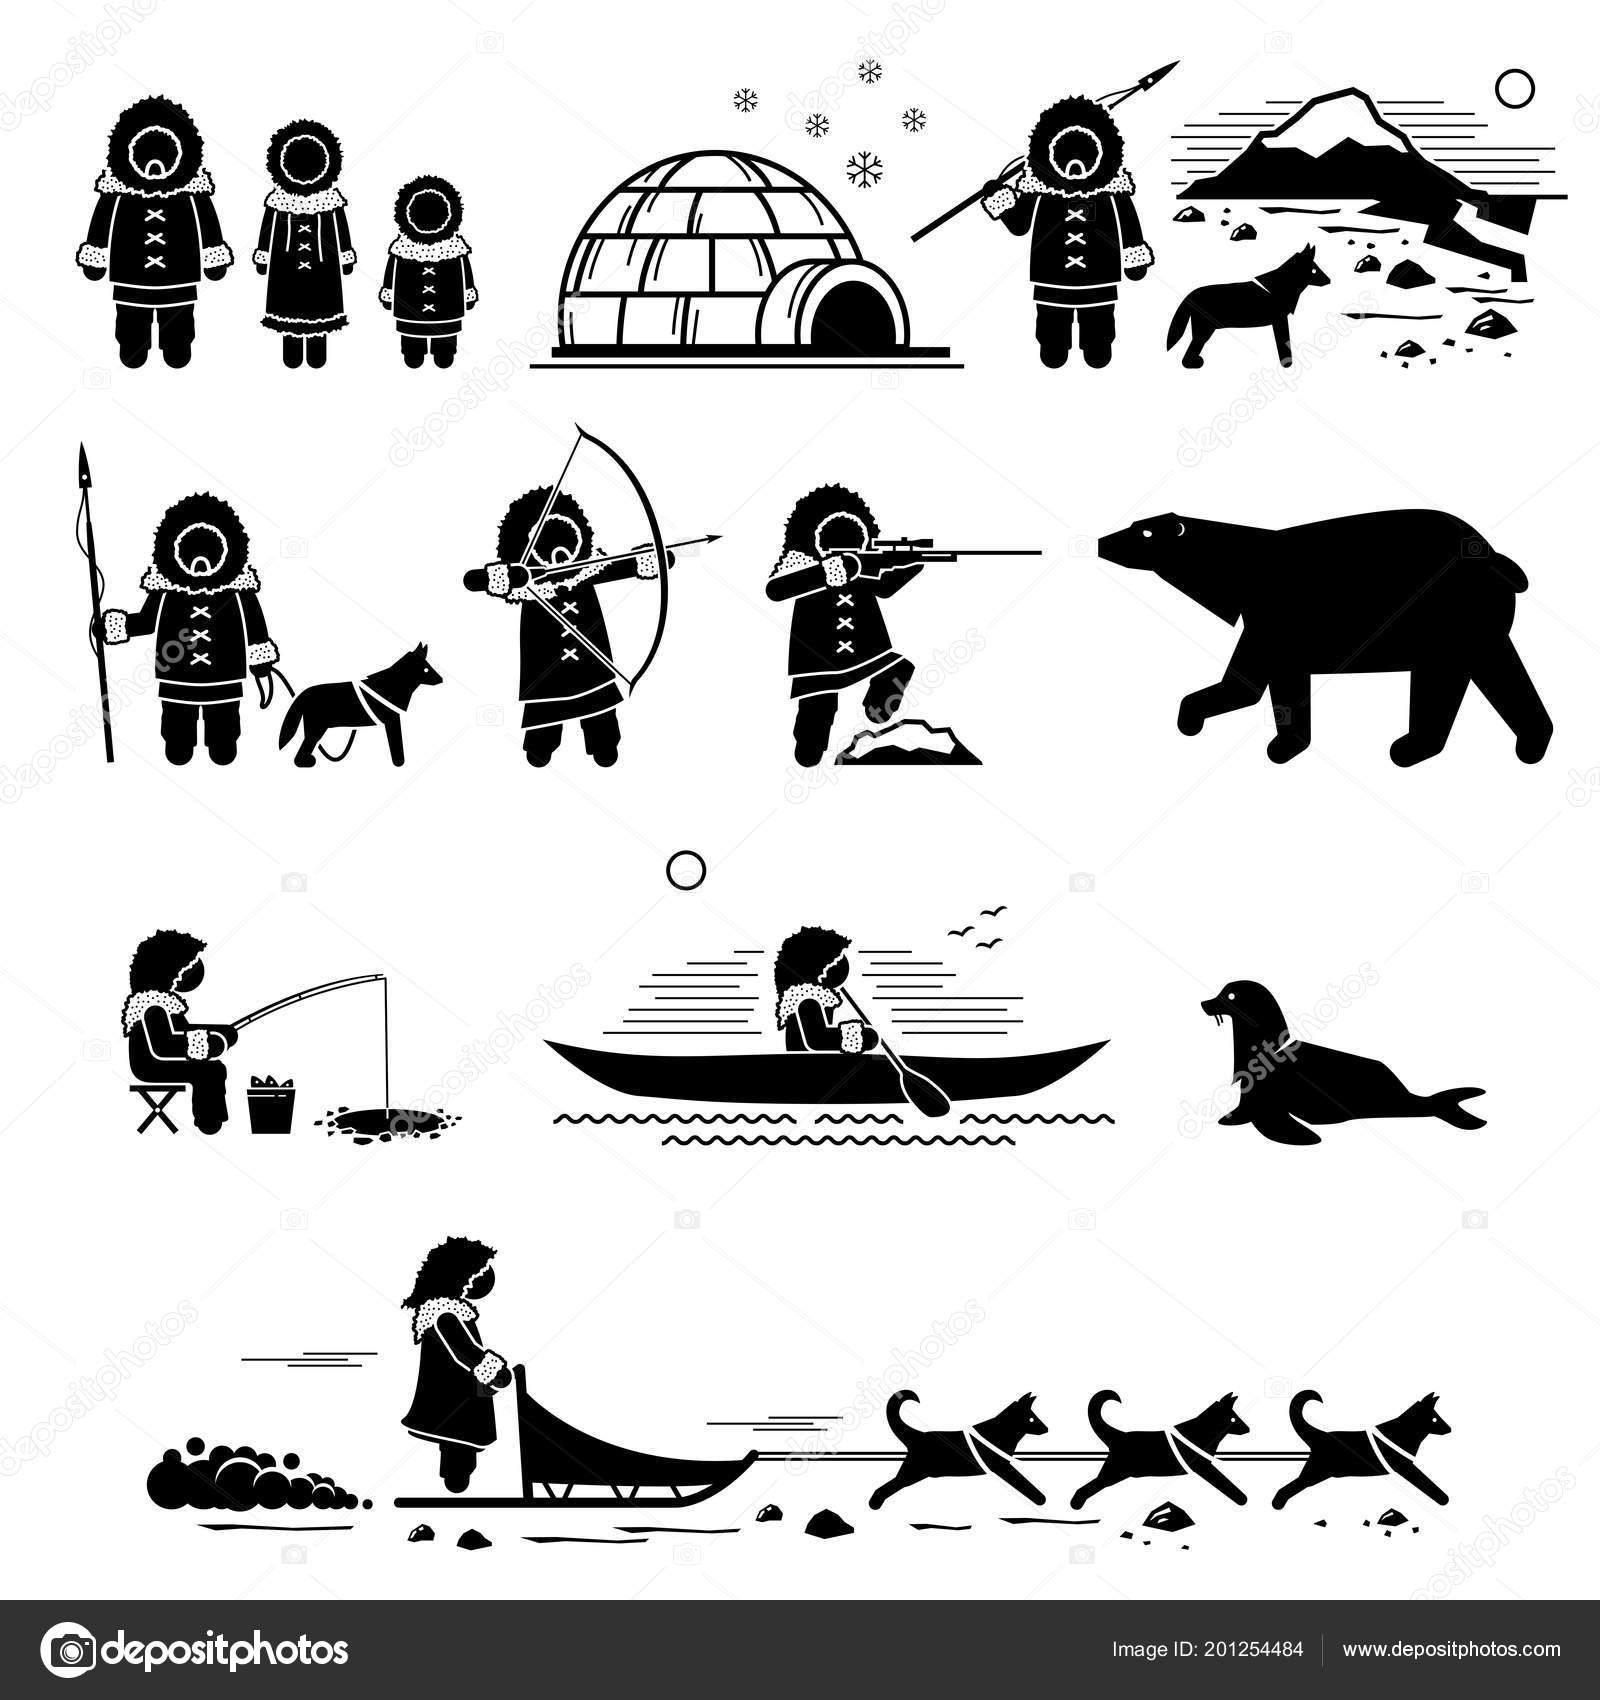 Eskimo People Lifestyle Animals Stick Figure Pictogram